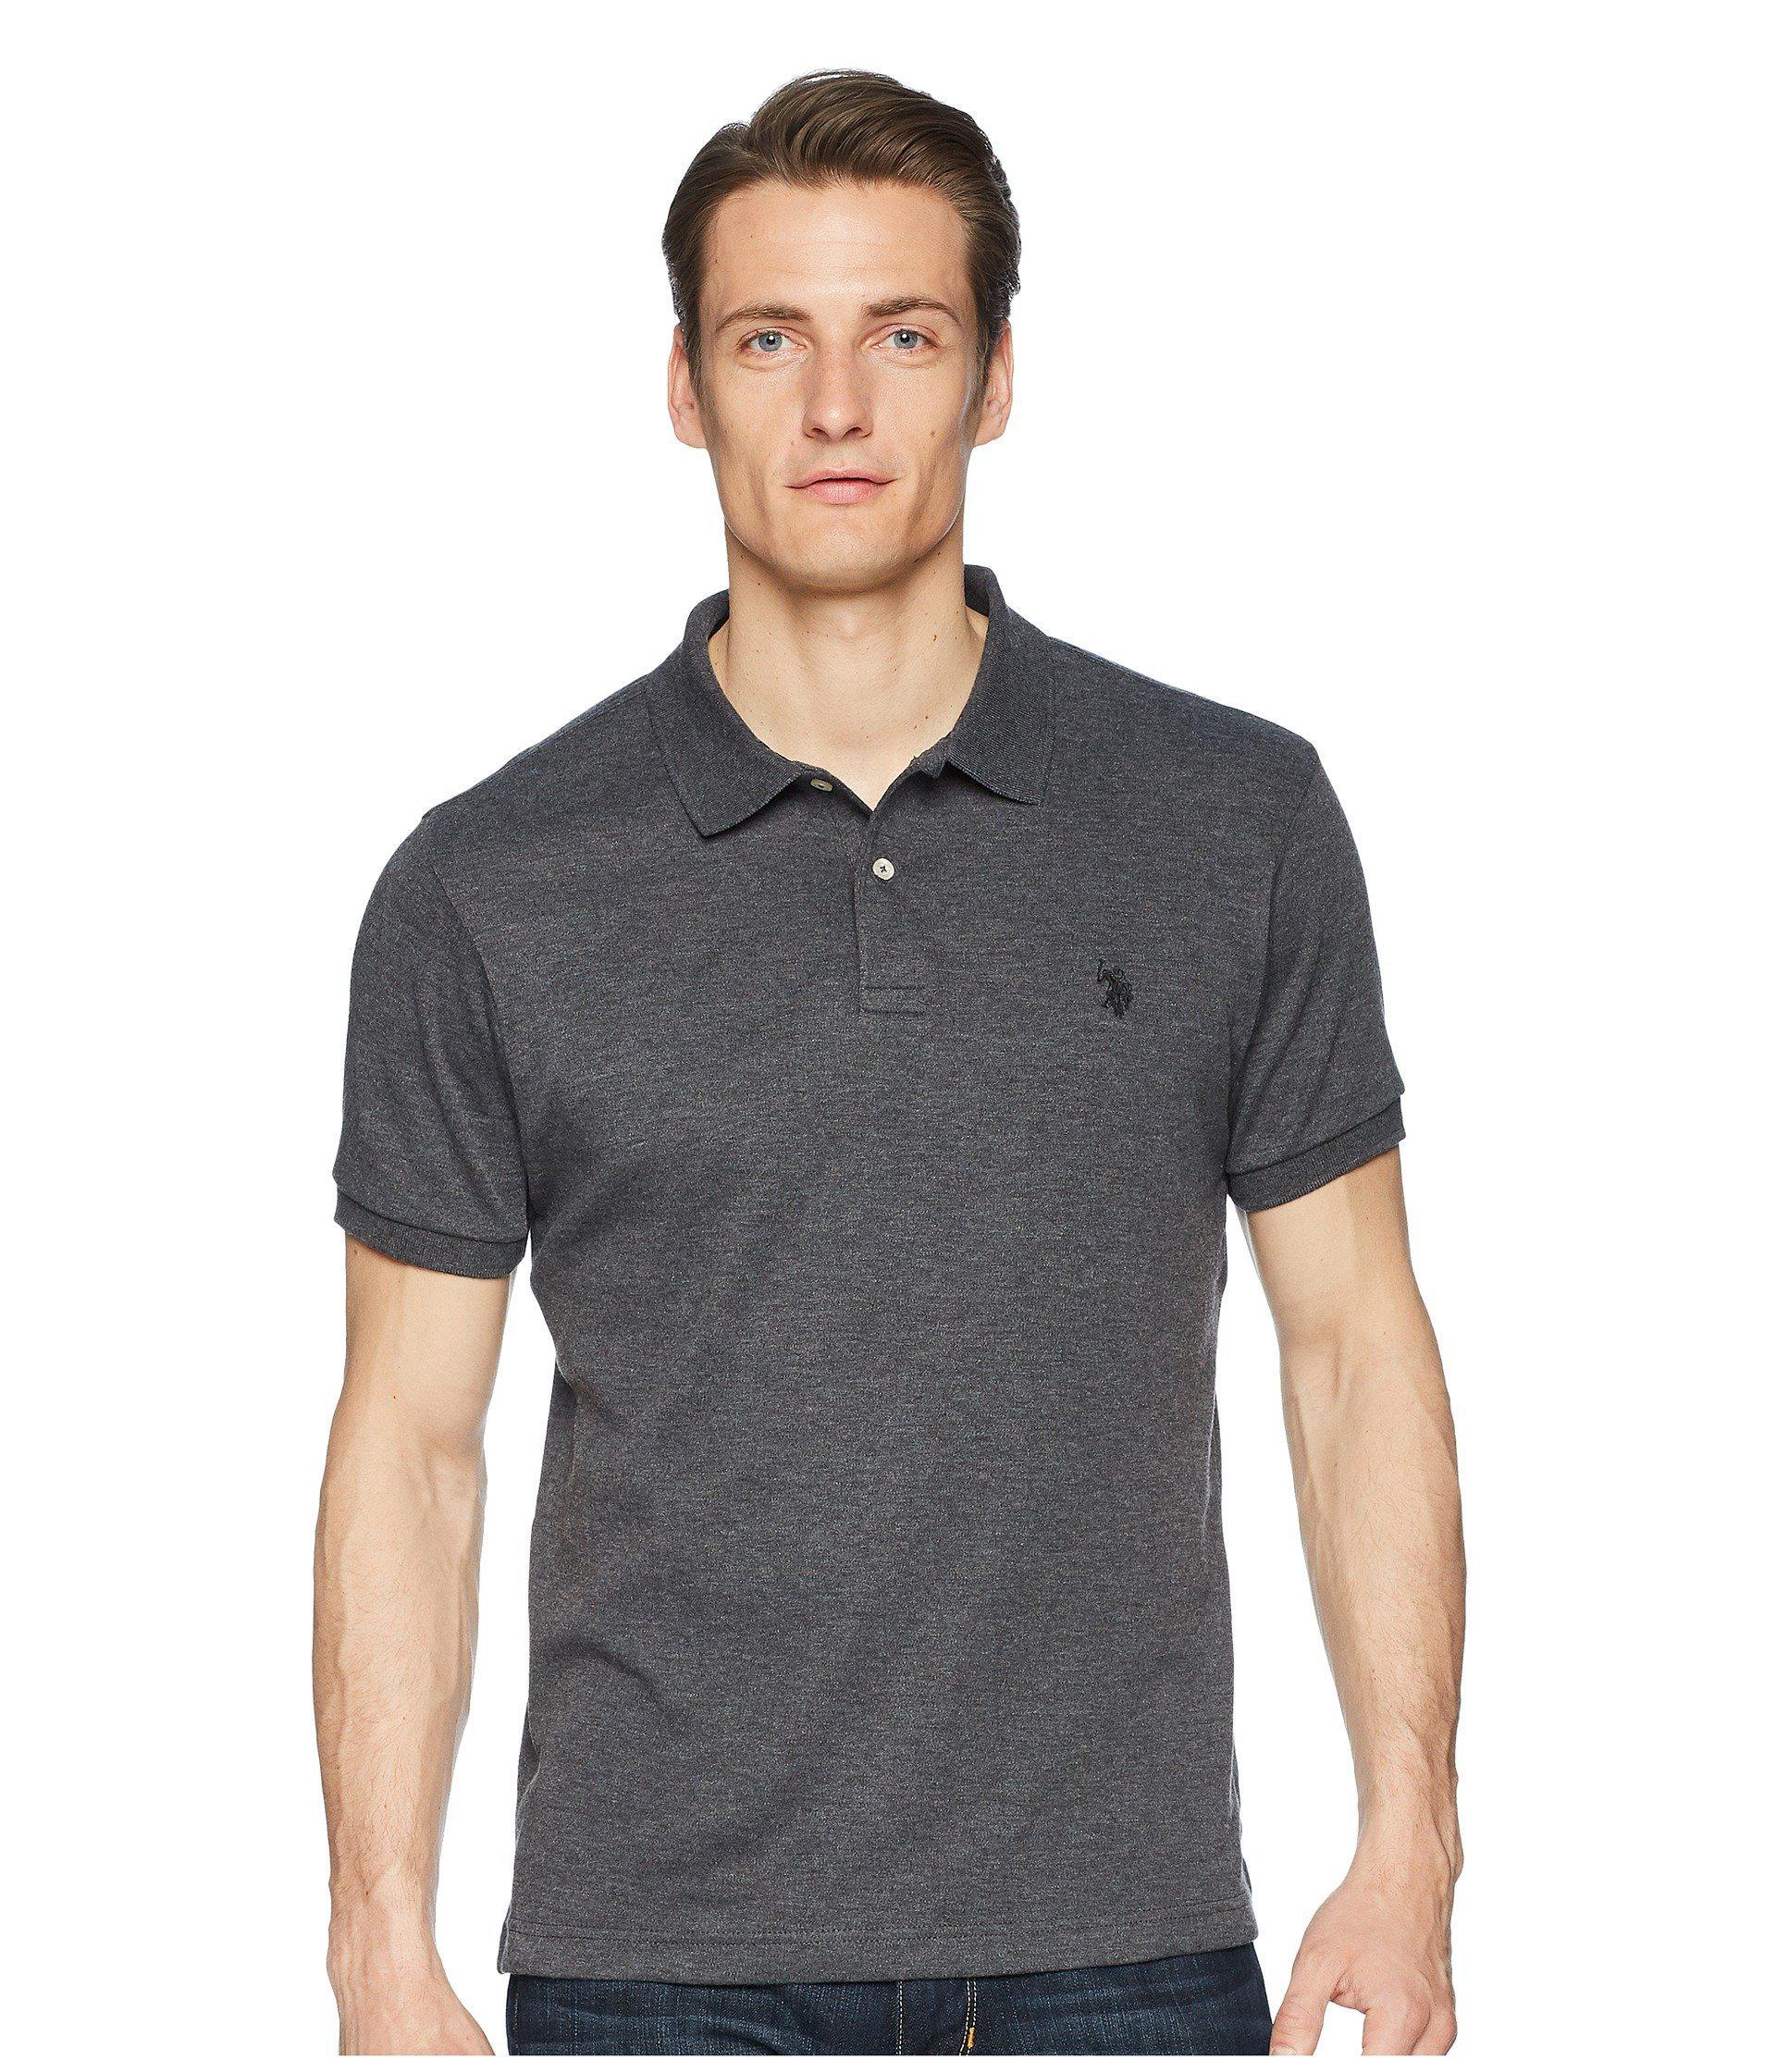 U S Polo Mens T Shirts